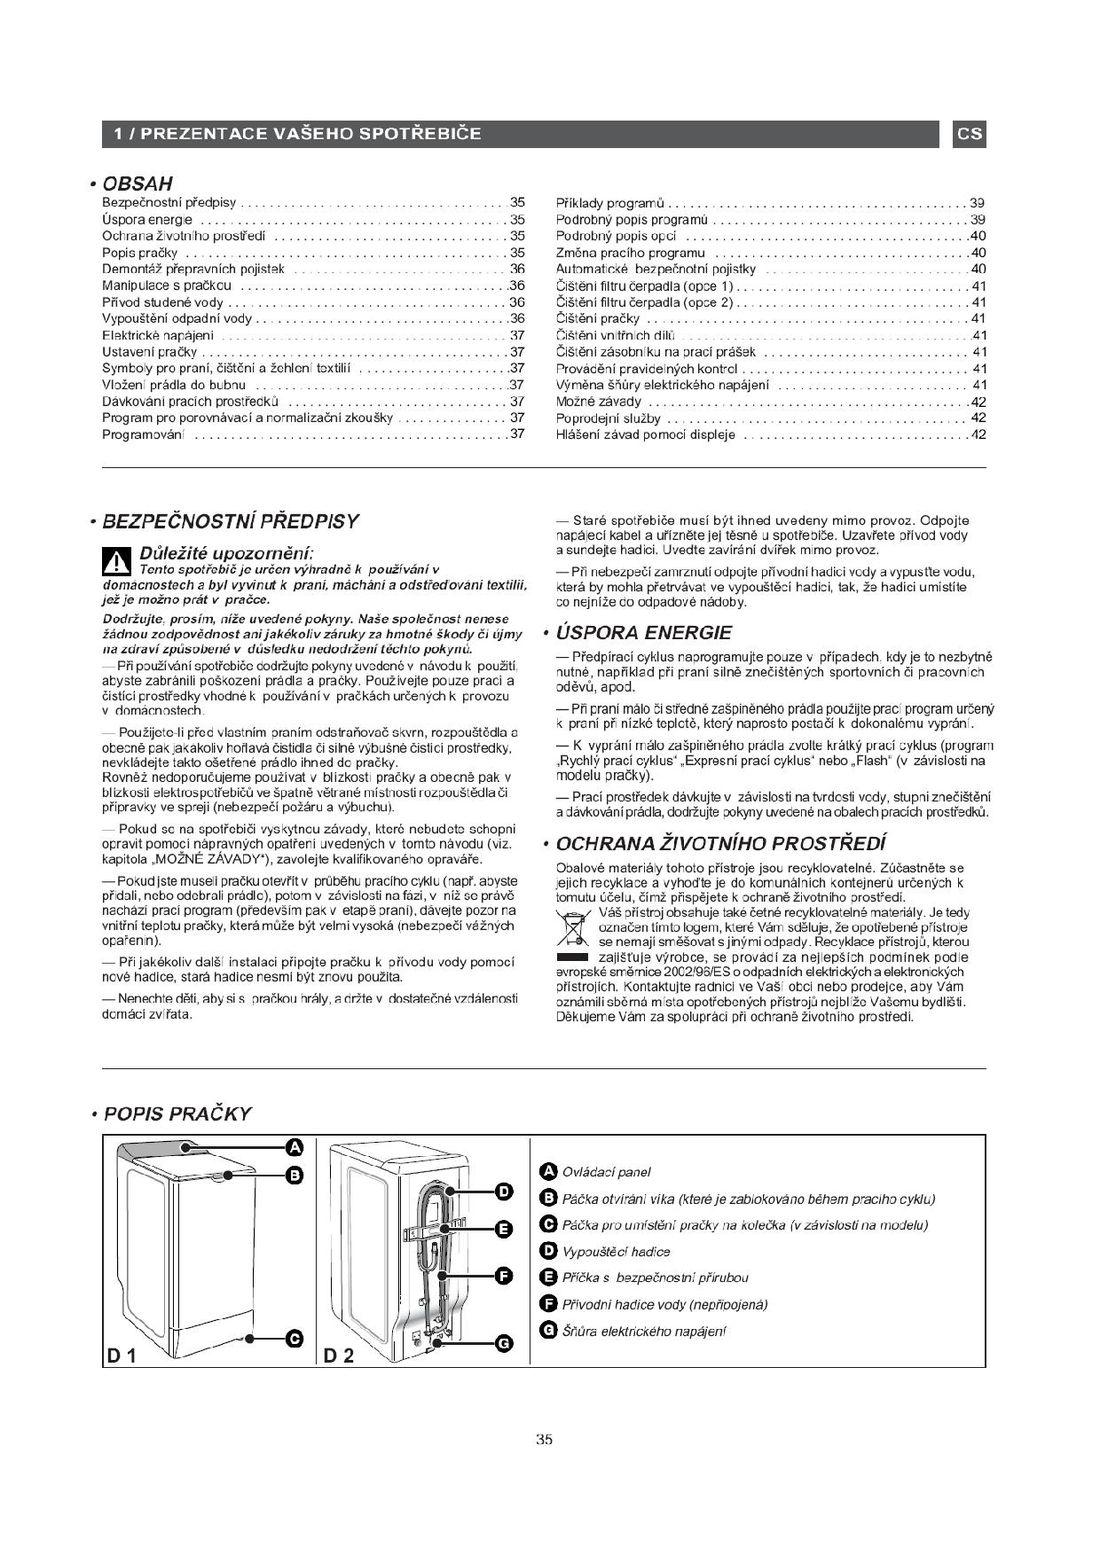 Gorenje Wt 63090 инструкция